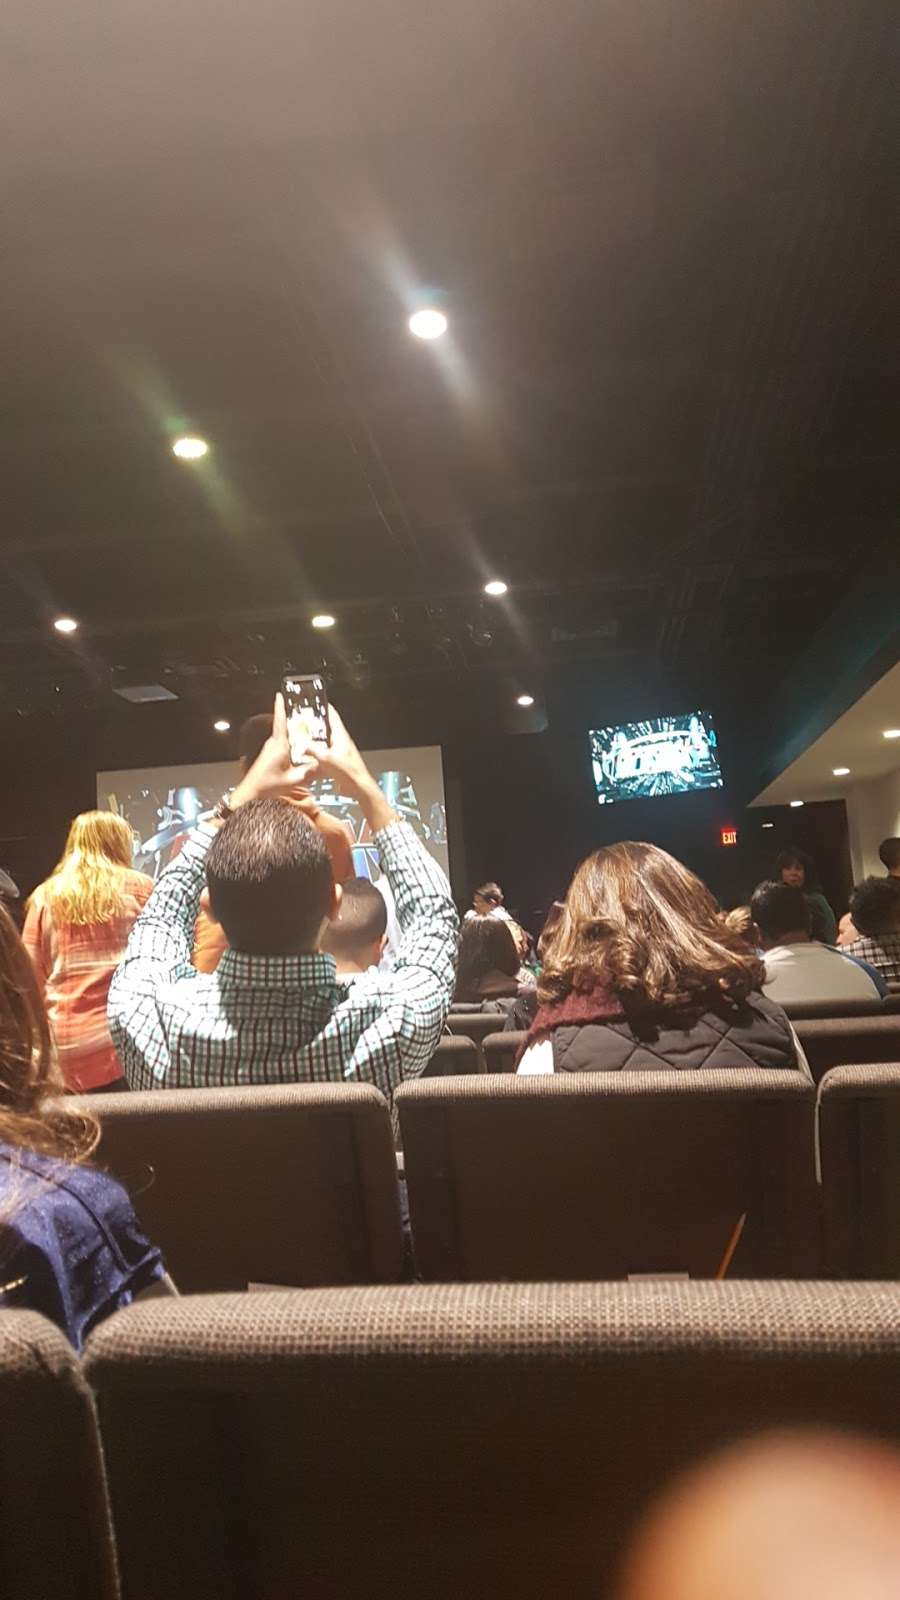 Bethany Church - church  | Photo 7 of 8 | Address: 605 Pascack Rd, Township of Washington, NJ 07676, USA | Phone: (201) 891-7494